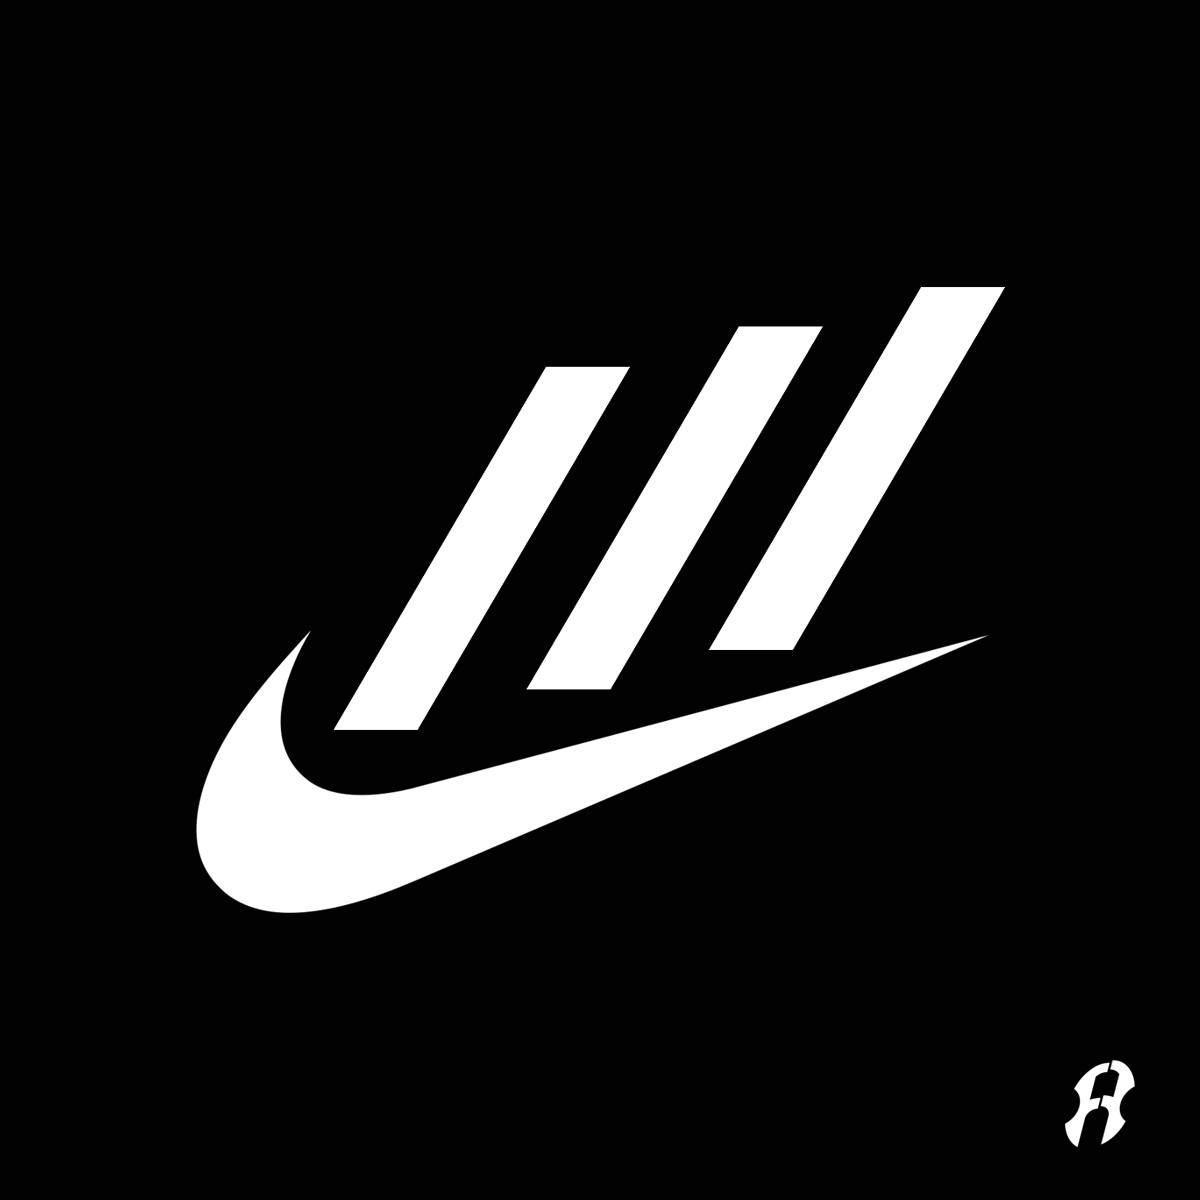 ArtStation - Nike X Adidas, Anupam Arts